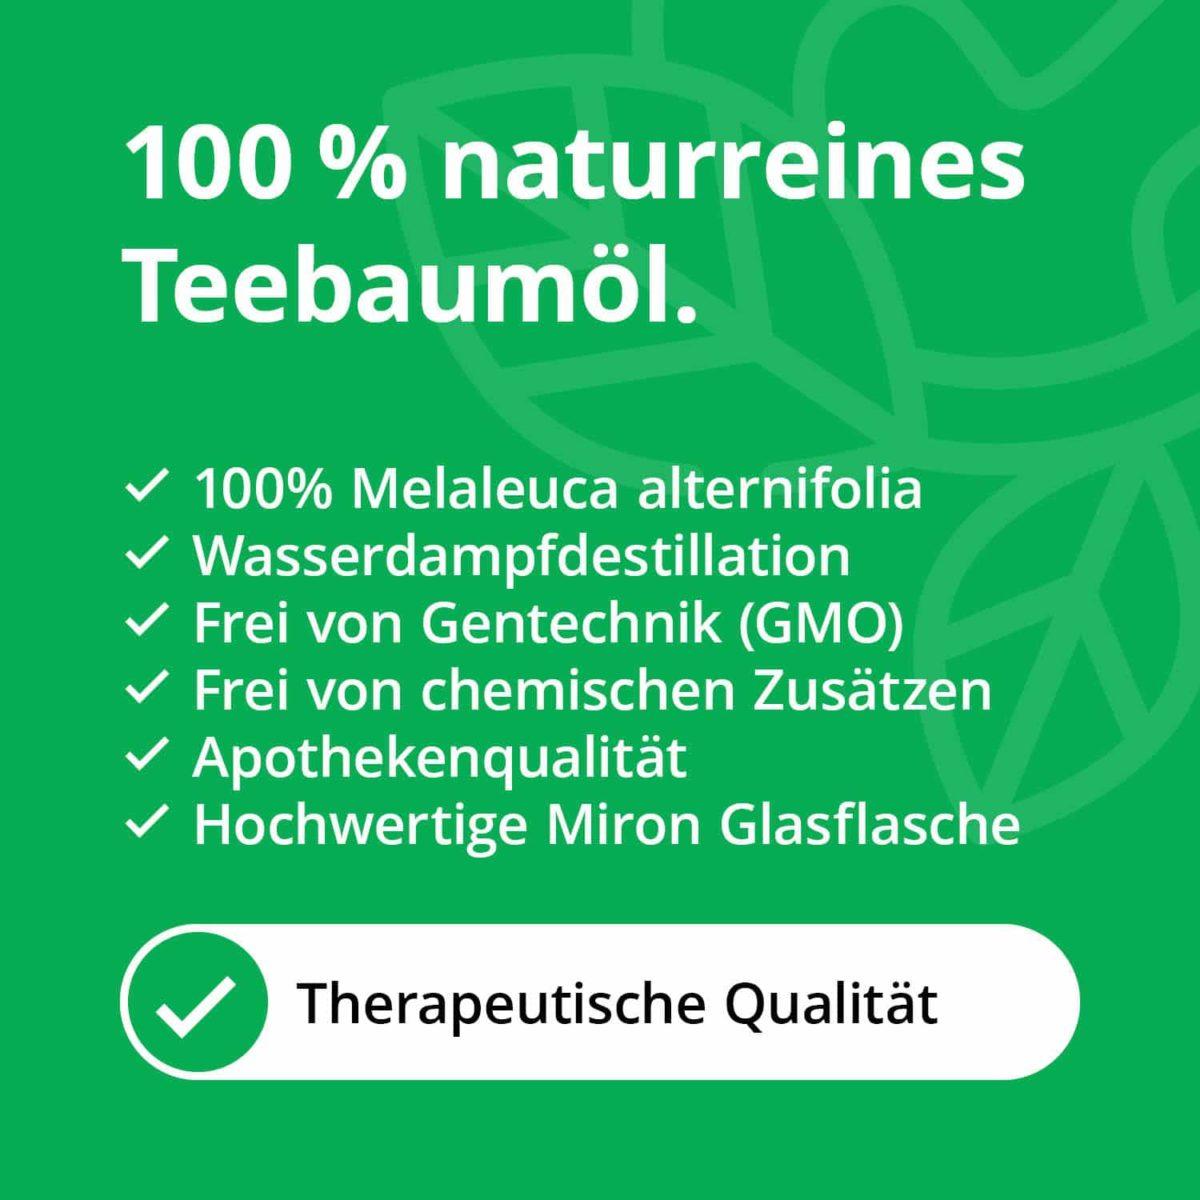 Casida Teebaumöl naturrein – 10 ml 15880774 PZN Apotheke ätherische Öle Melaleuca alternifolia Hautpflege Nagelpilz5